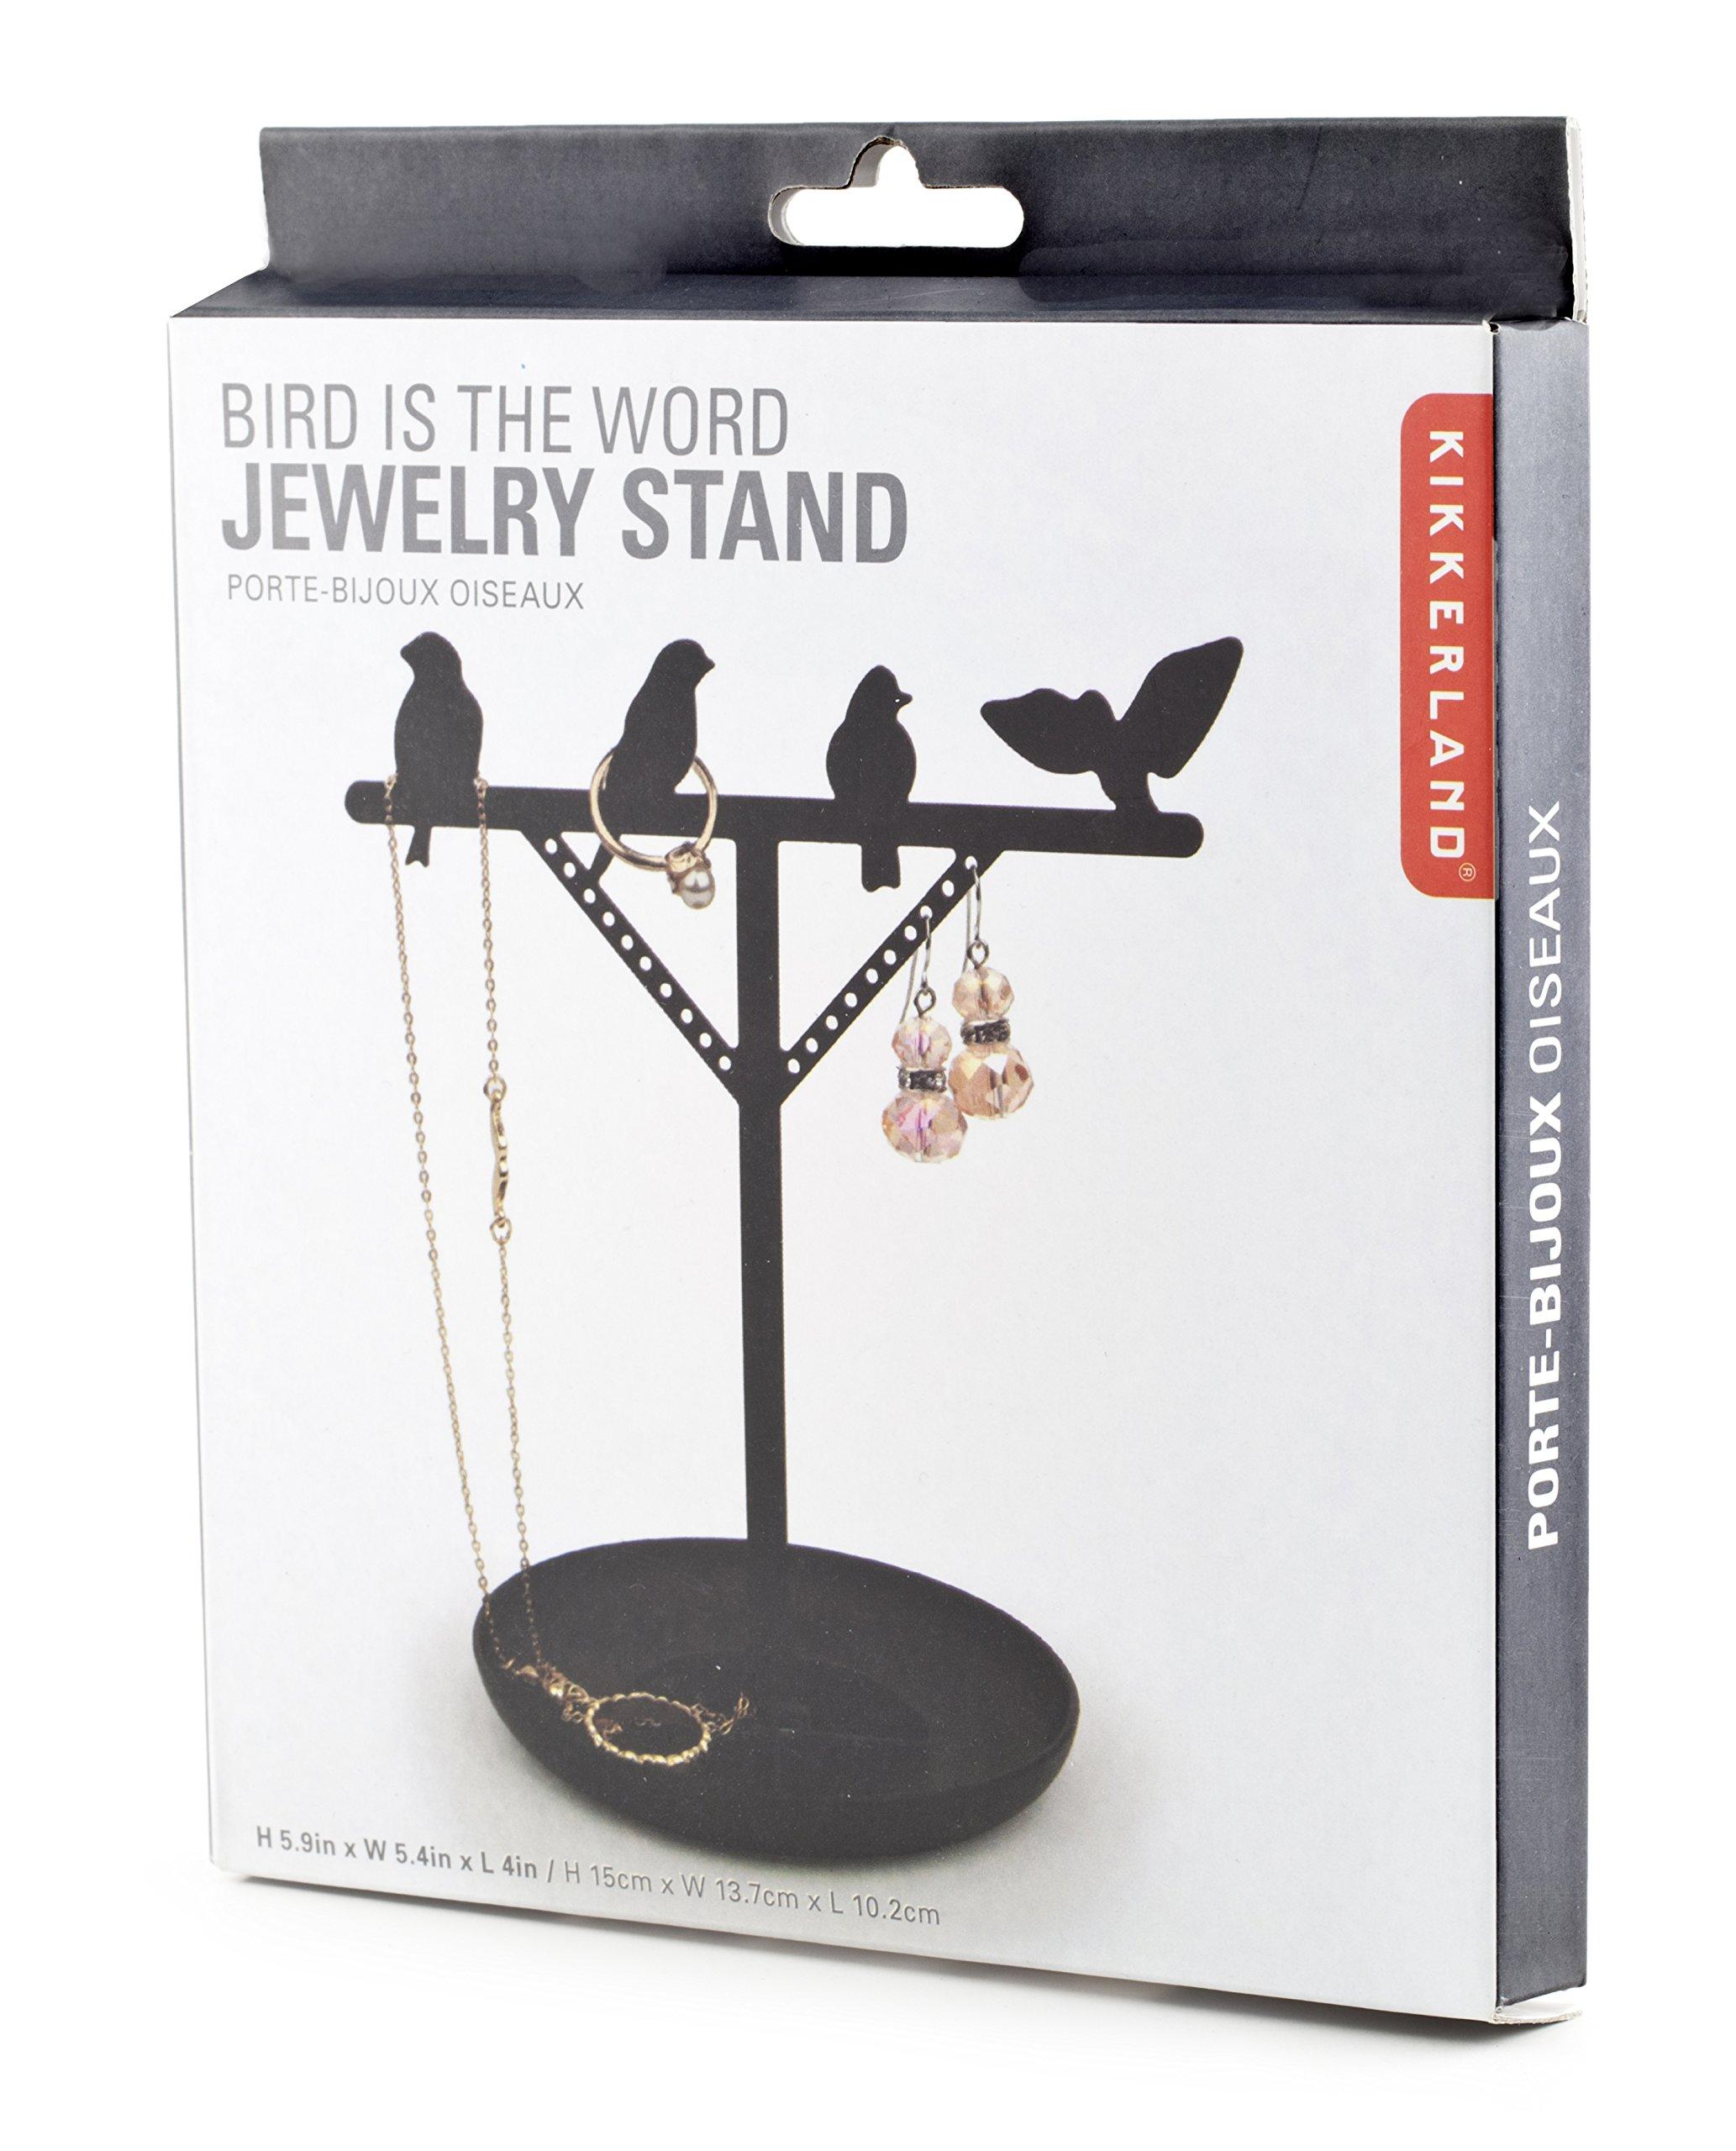 Kikkerland Jewelry Holder, Pack Rack